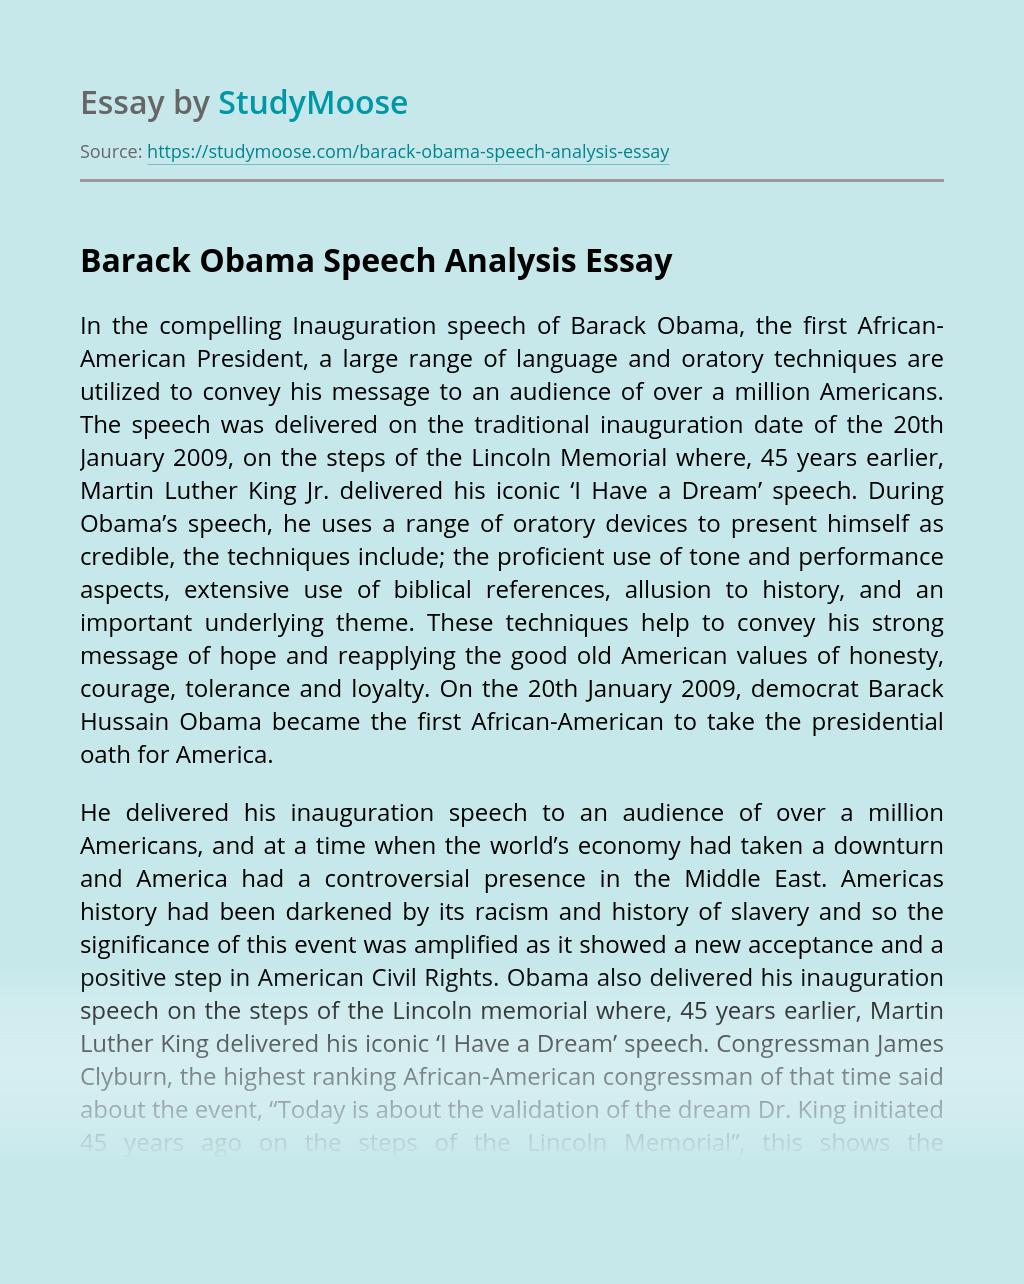 Barack Obama Speech Analysis